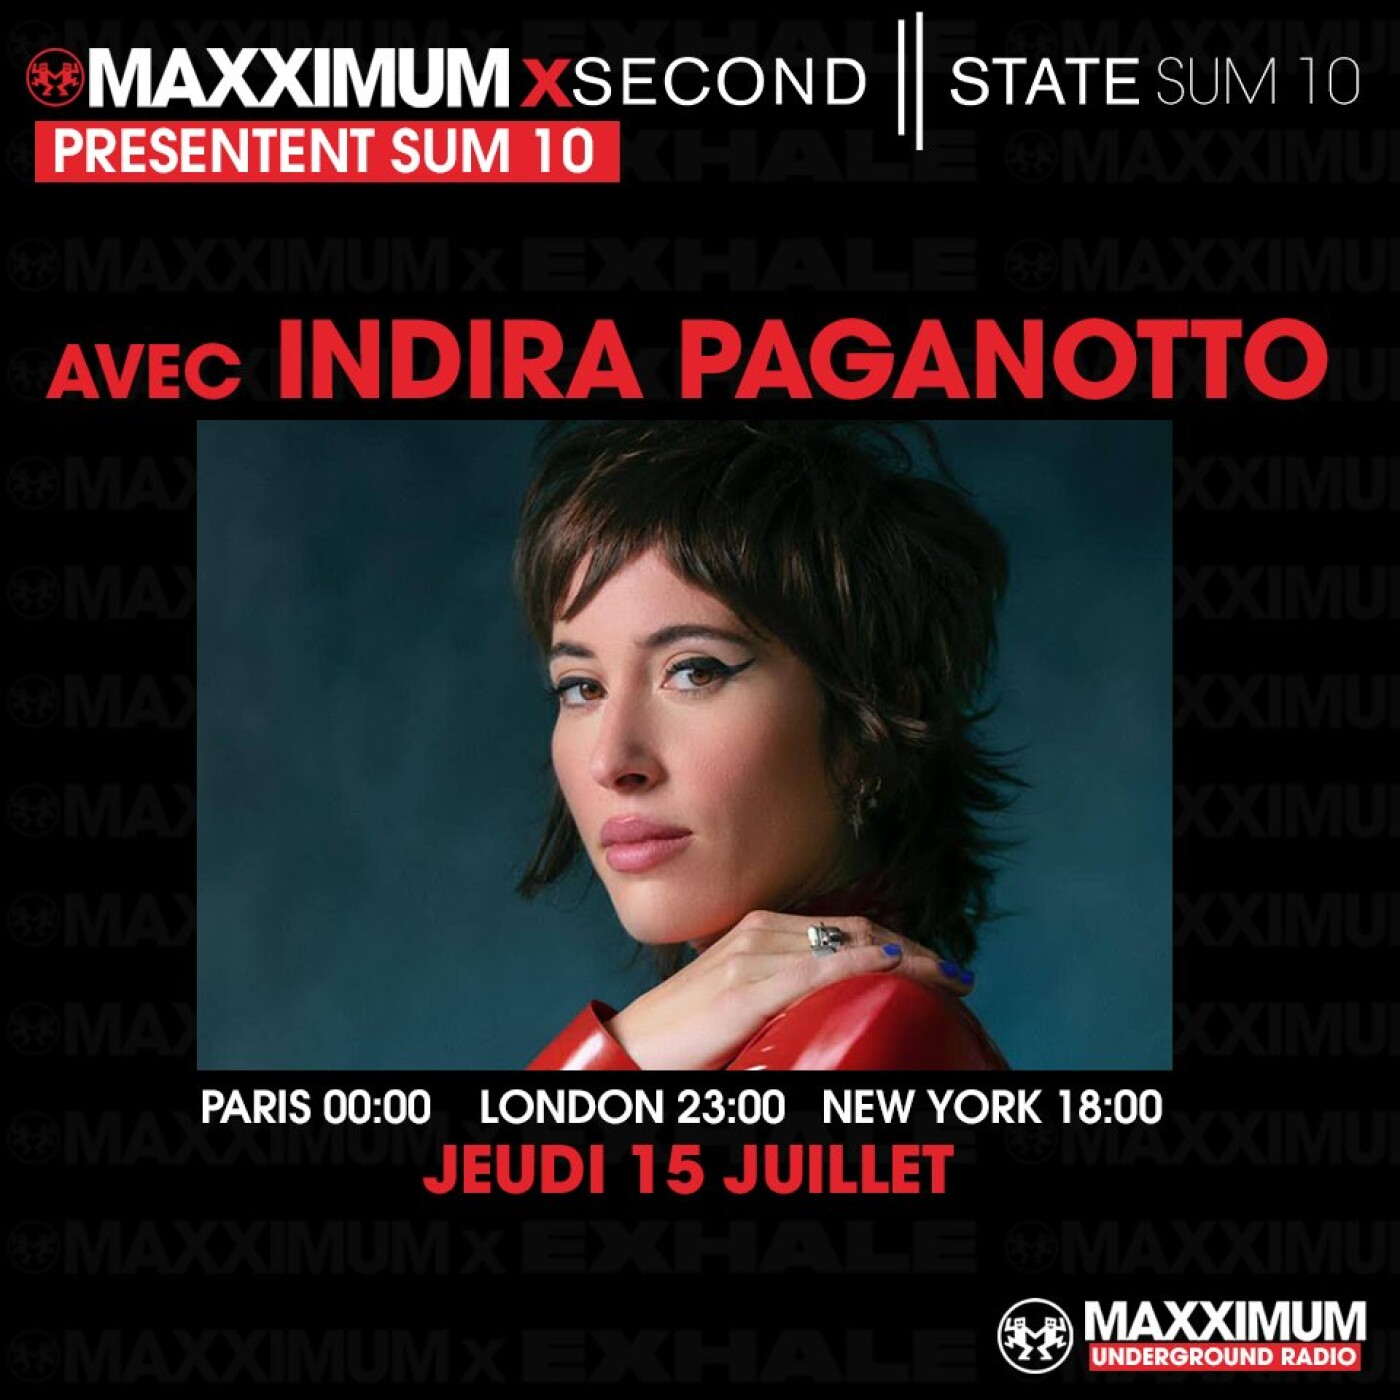 MAXXIMUM INVITE SECOND STATE : INDIRA PAGANOTTO